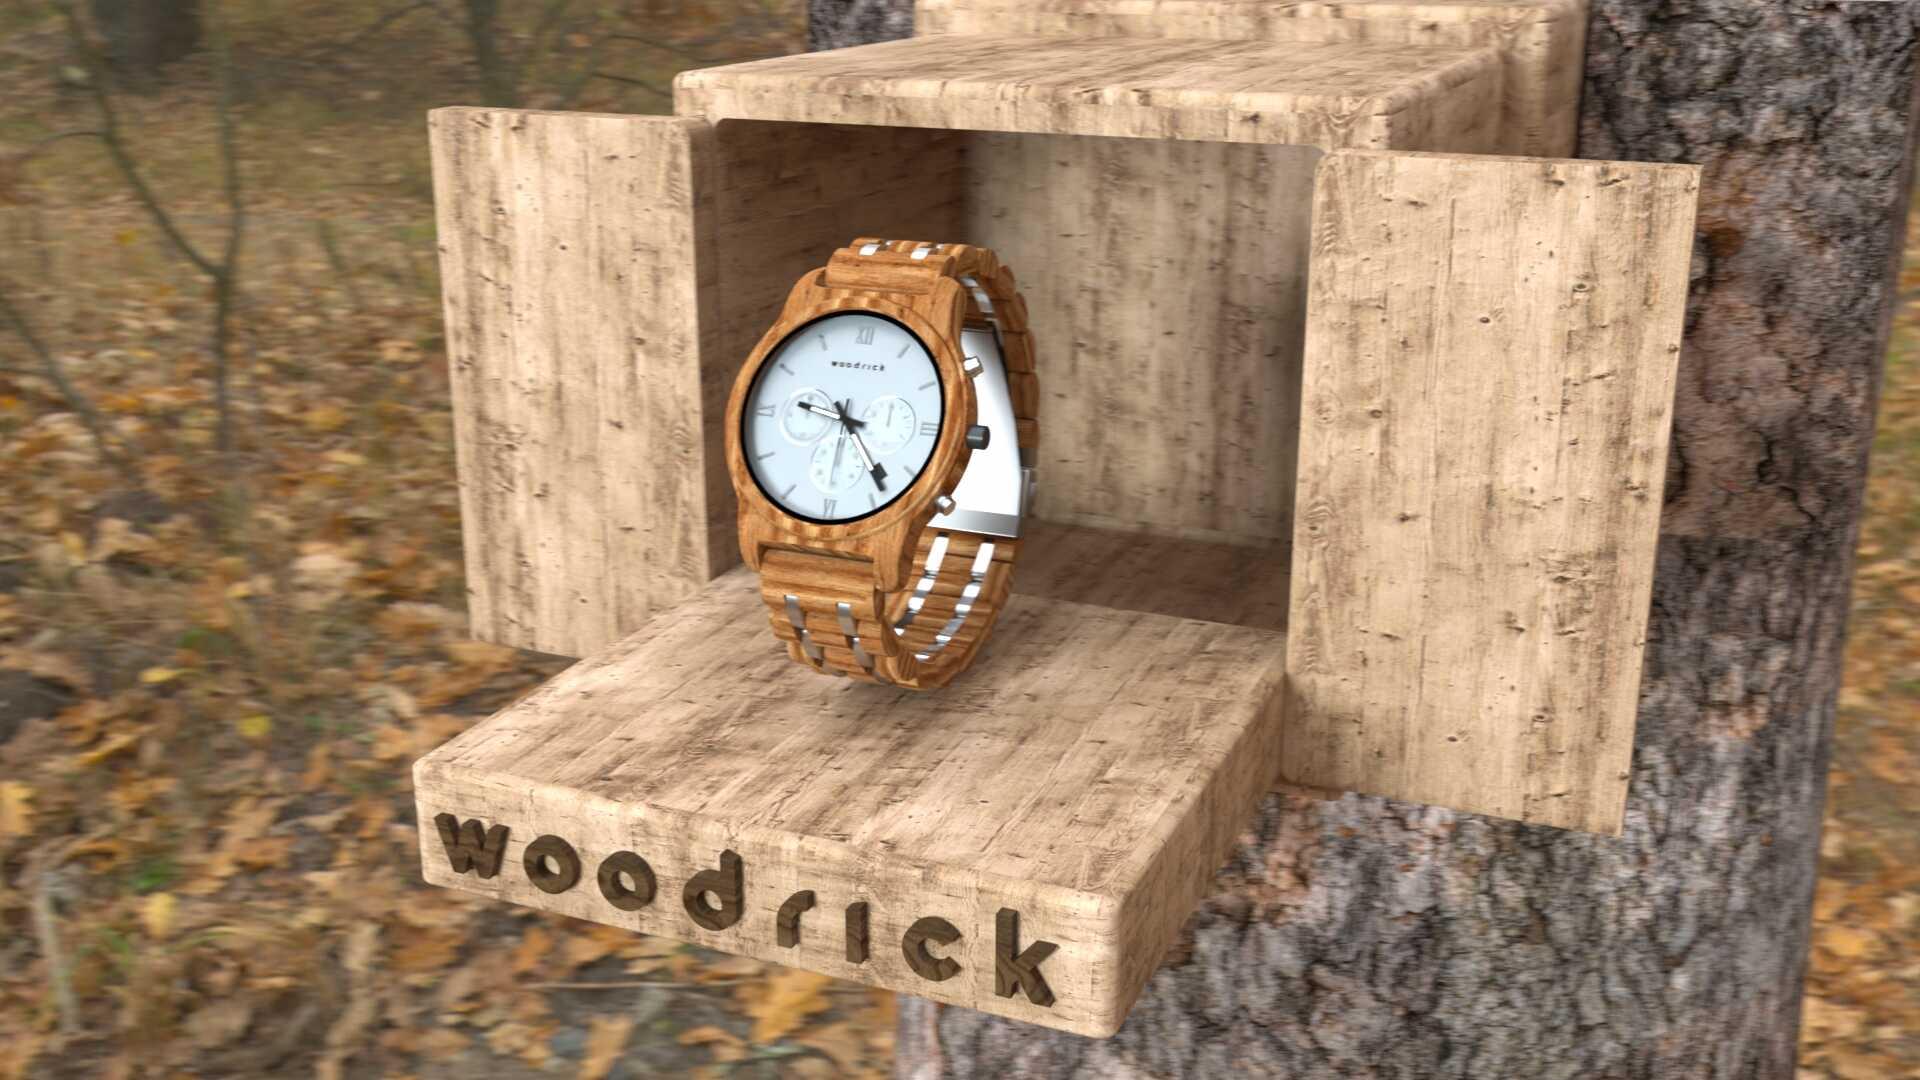 Woodrick – Motion Graphics Spot